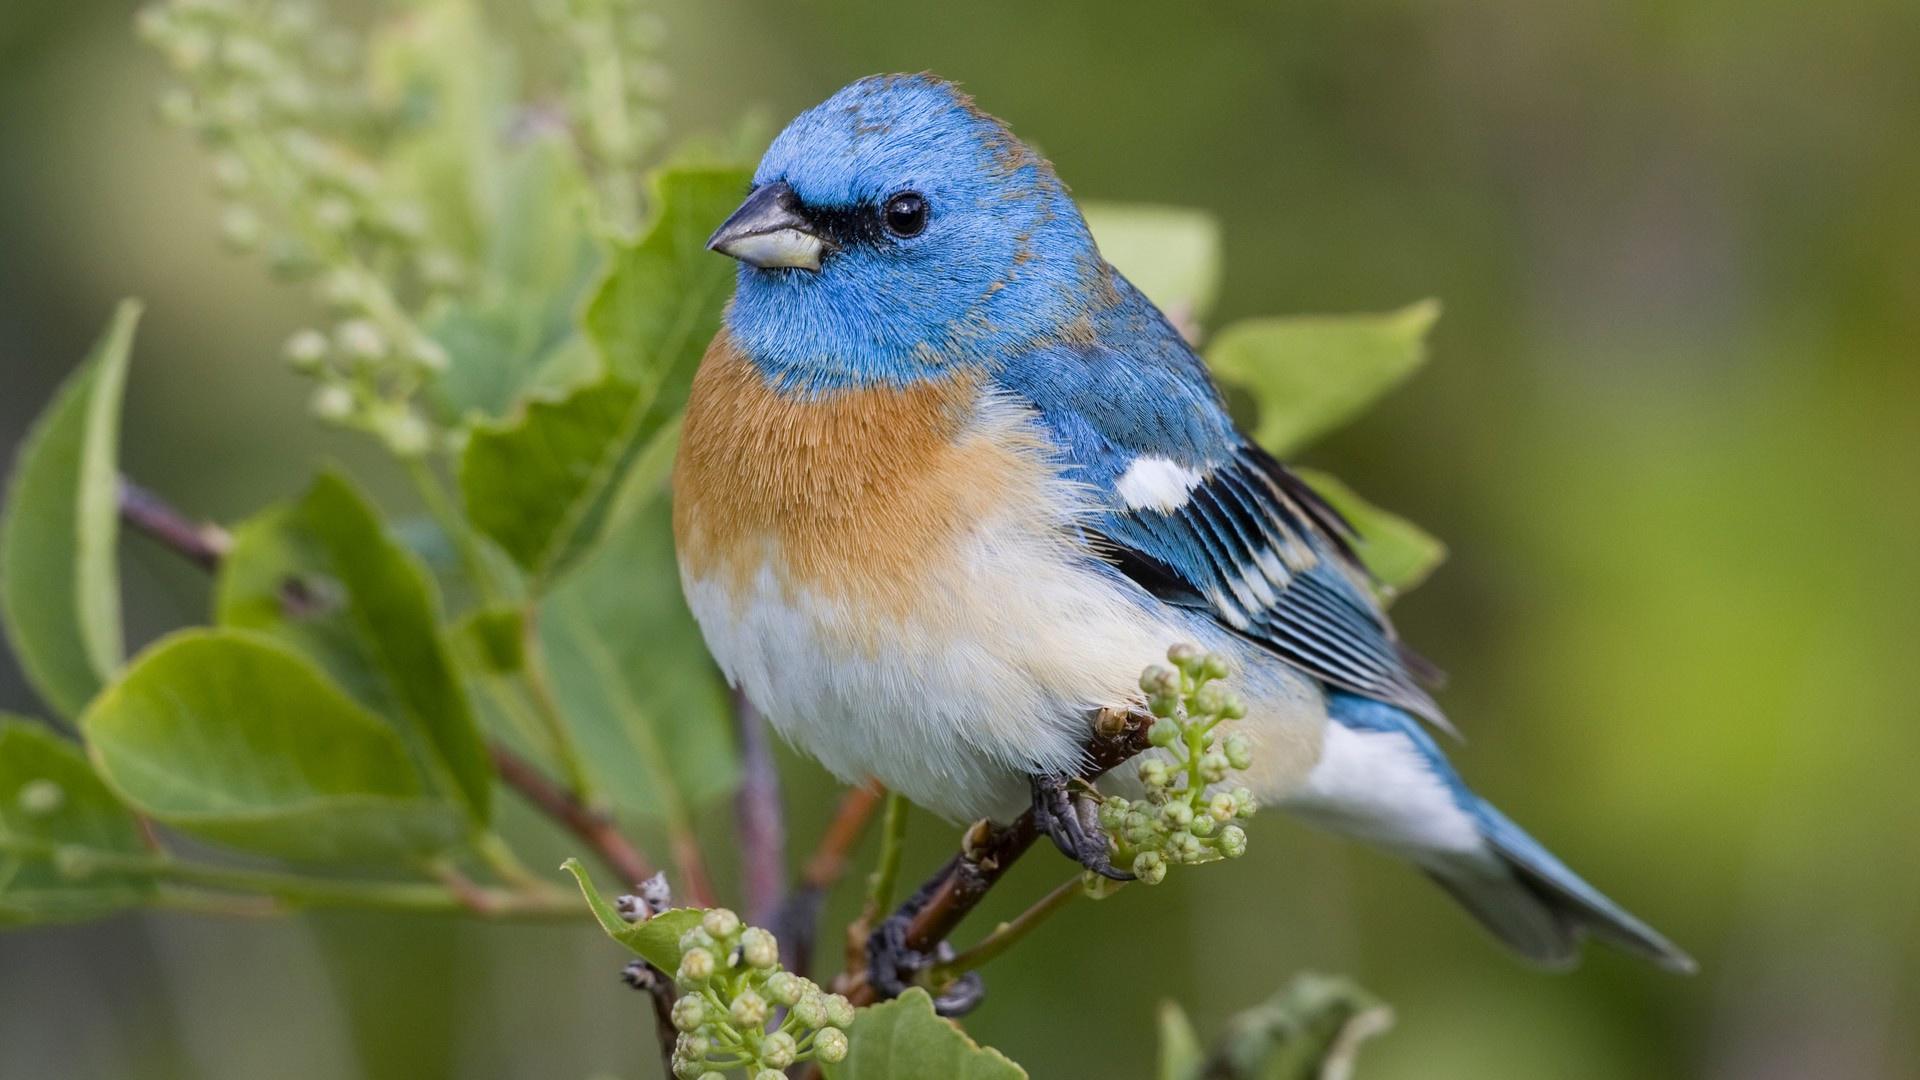 Download Beautiful Blue Bird Wallpaper Full HD Wallpapers 1920x1080